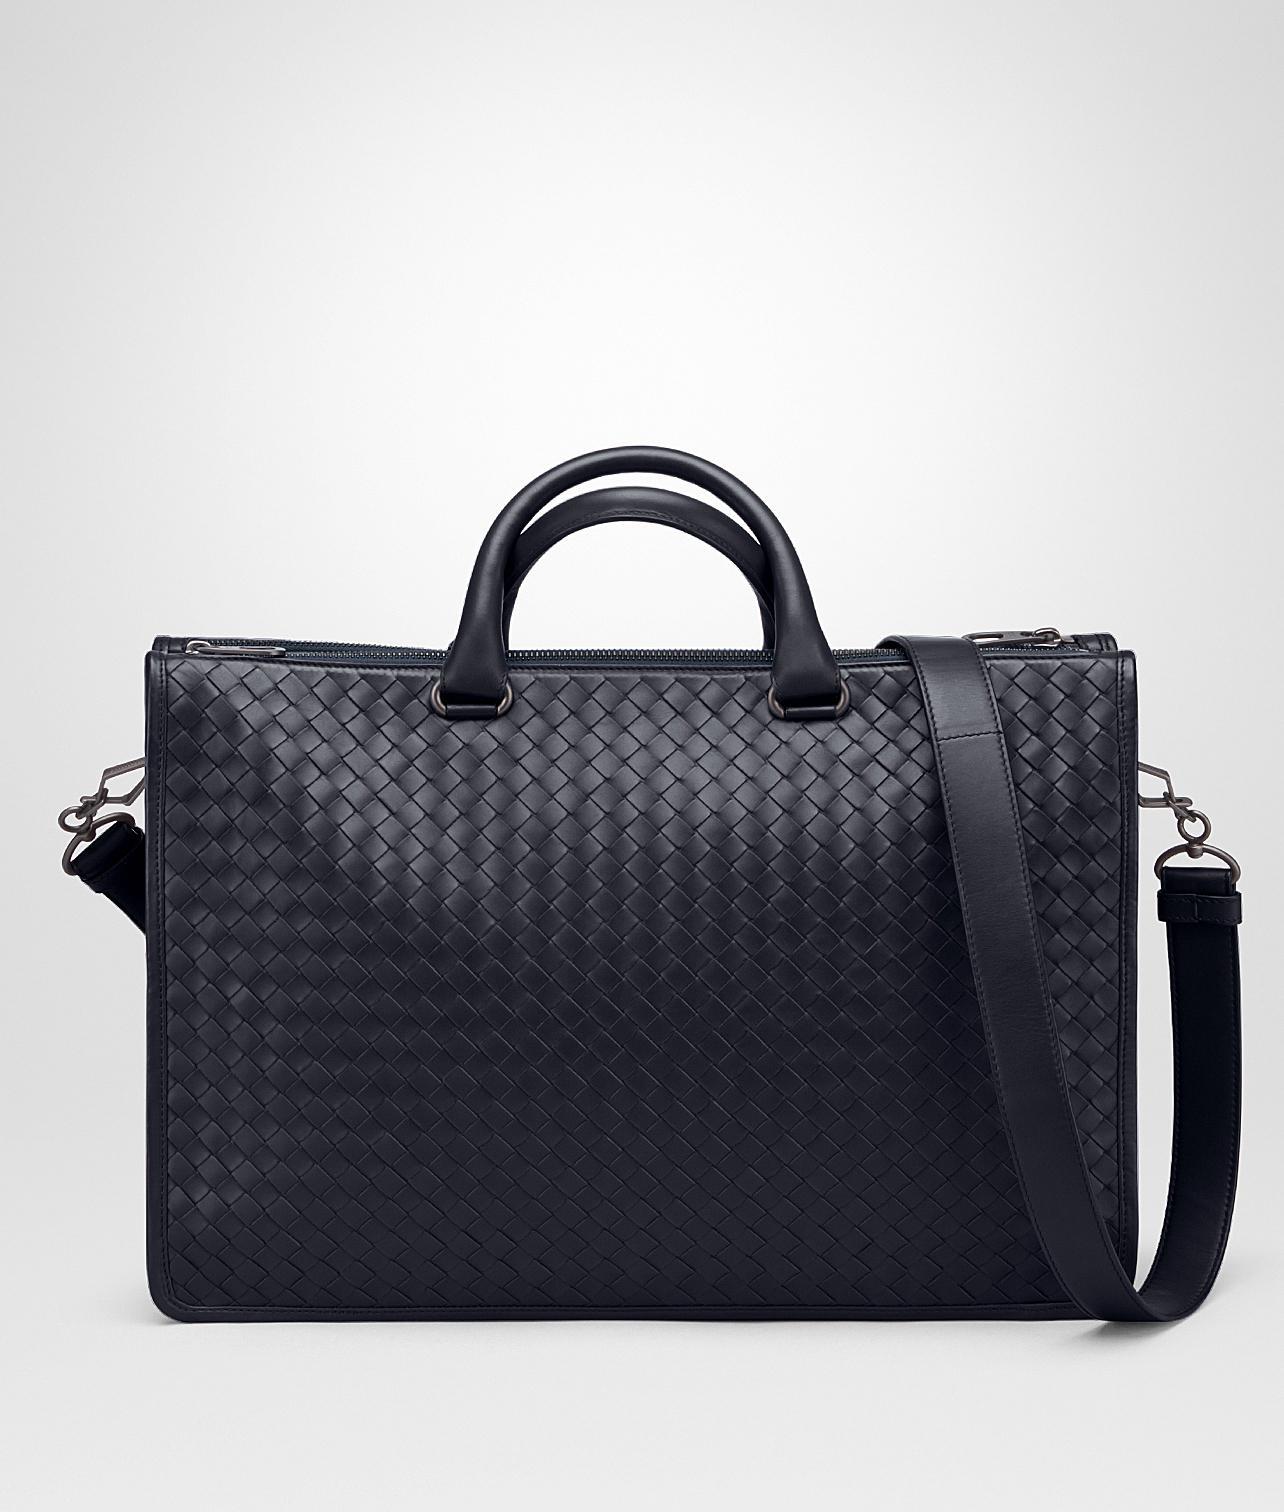 9b4f8c2be103 Bottega Veneta Prusse Intrecciato Calf Briefcase in Black for Men - Lyst